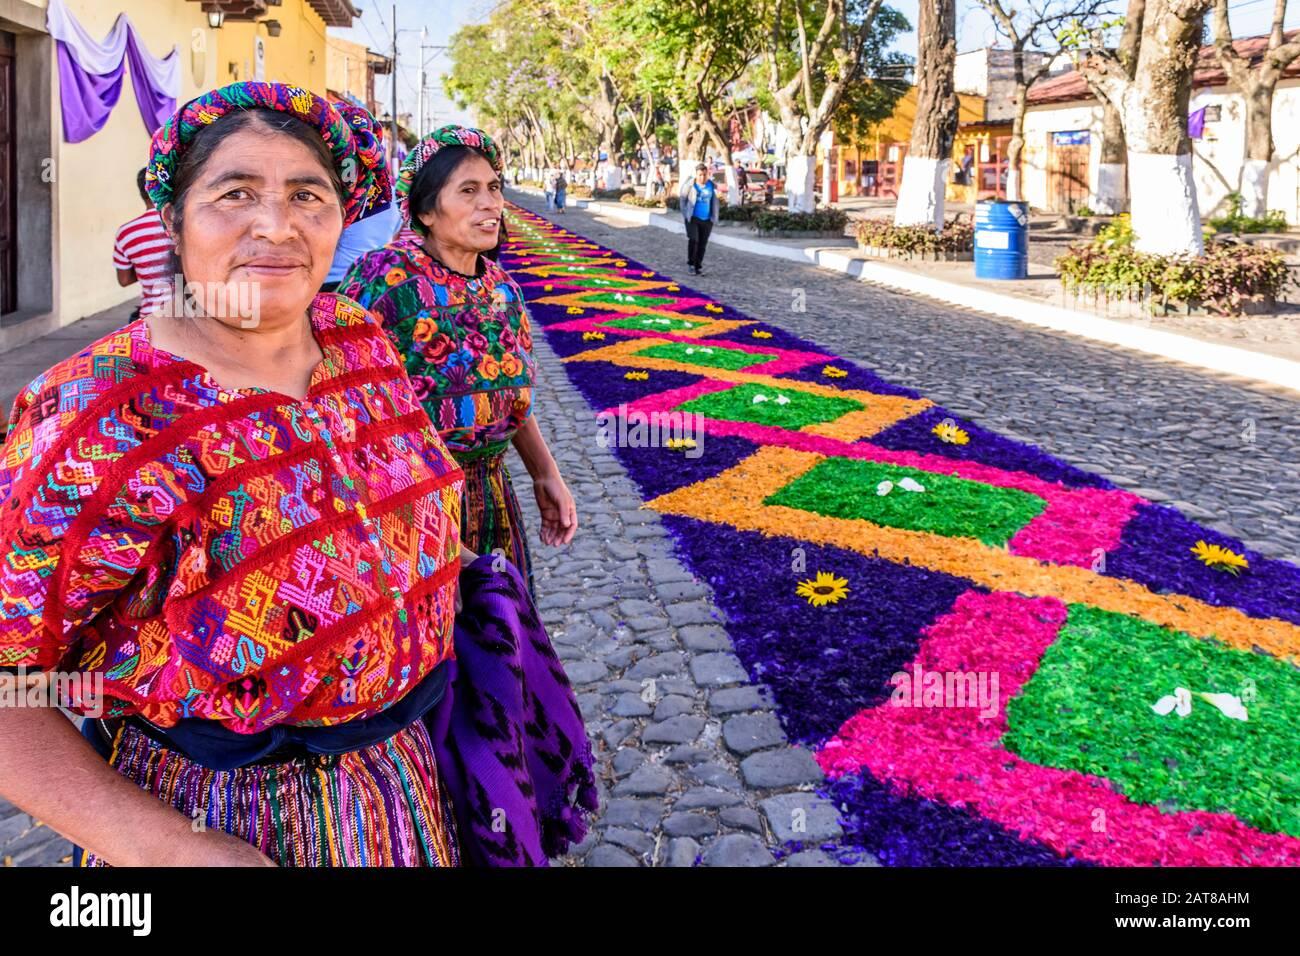 Antigua, Guatemala -  April 14, 2019: Maya ladies & Palm Sunday procession carpet in UNESCO World Heritage Site with famed Holy Week celebrations. Stock Photo